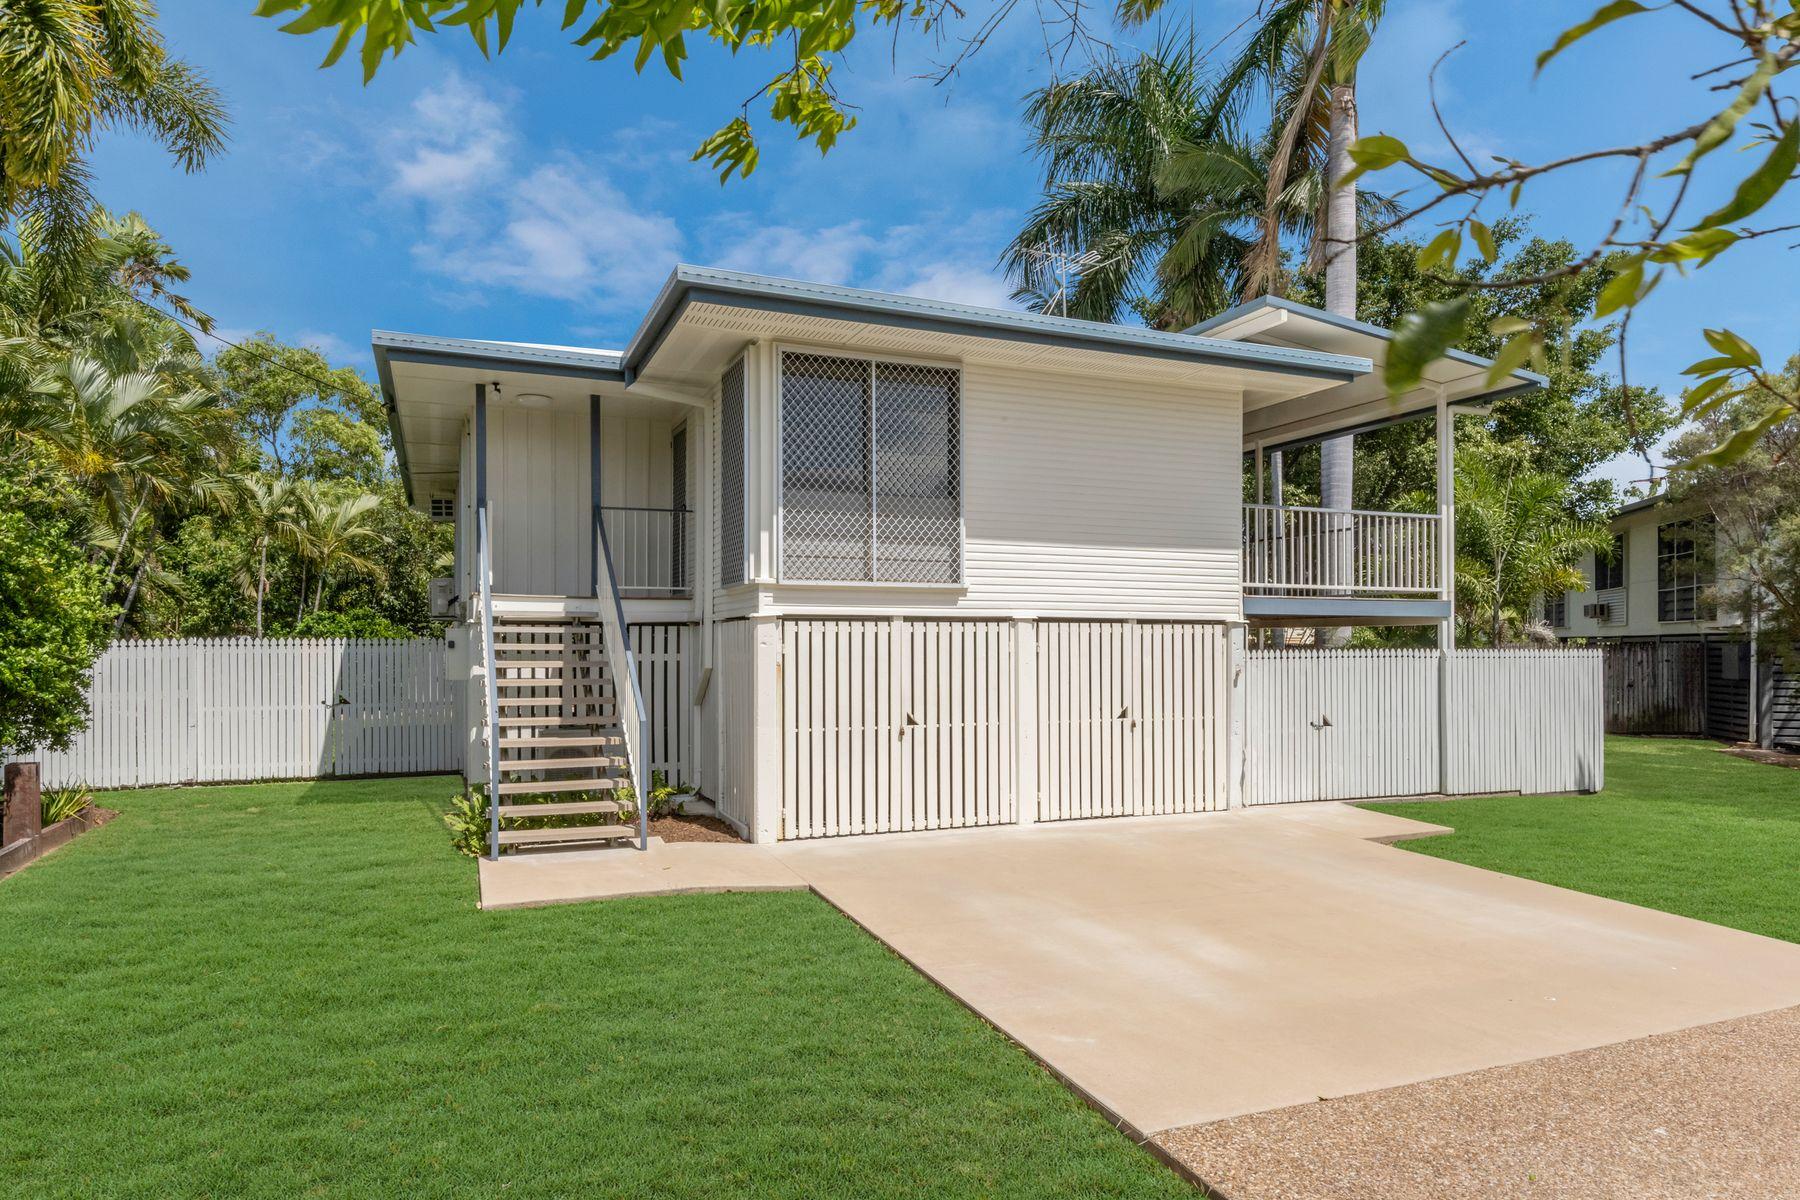 14 Dacosta Court, Vincent, QLD 4814